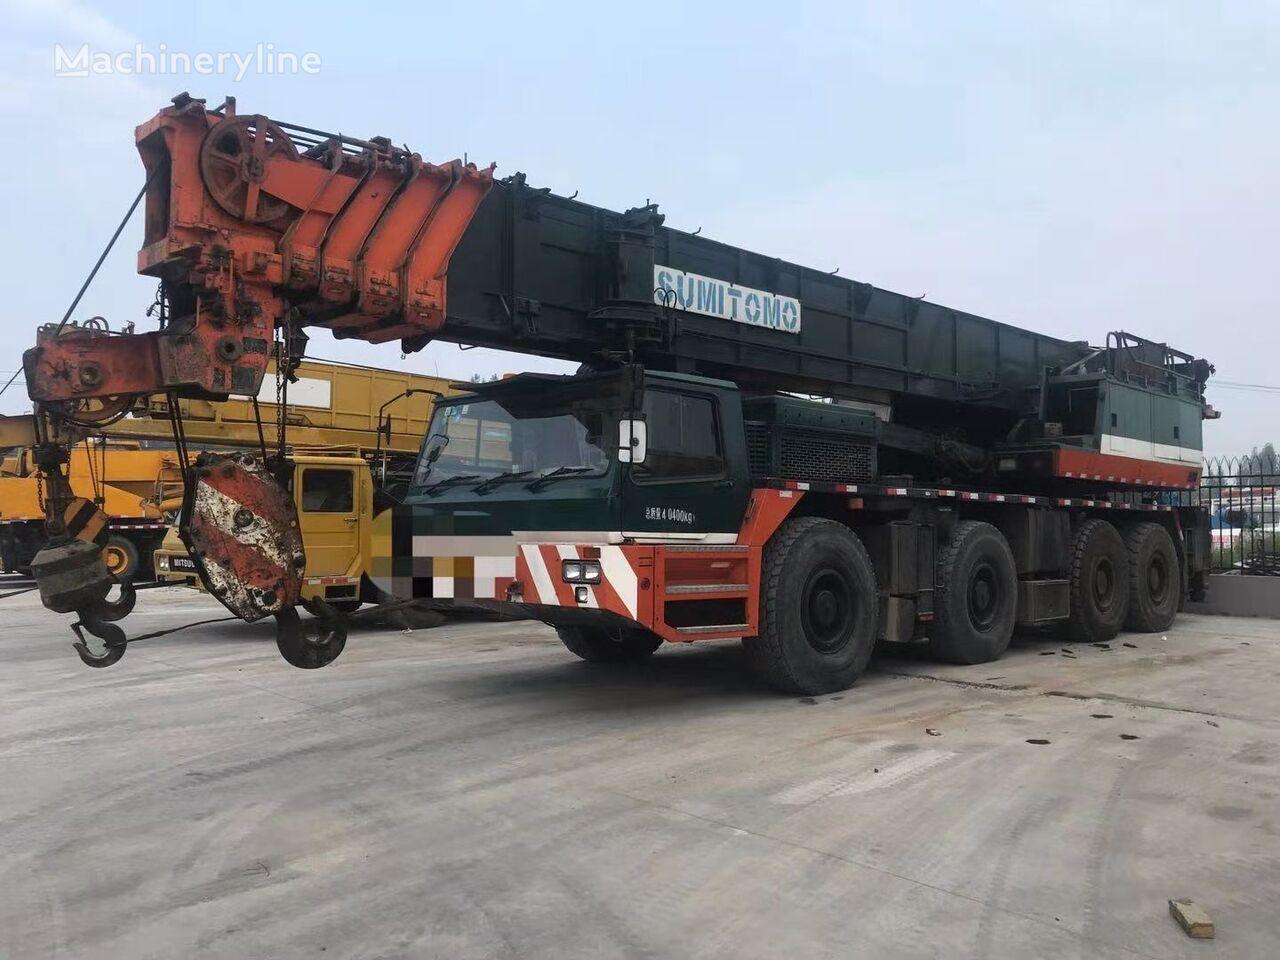 SUMITOMO SA1100 used sumitomo truck crane mobile crane